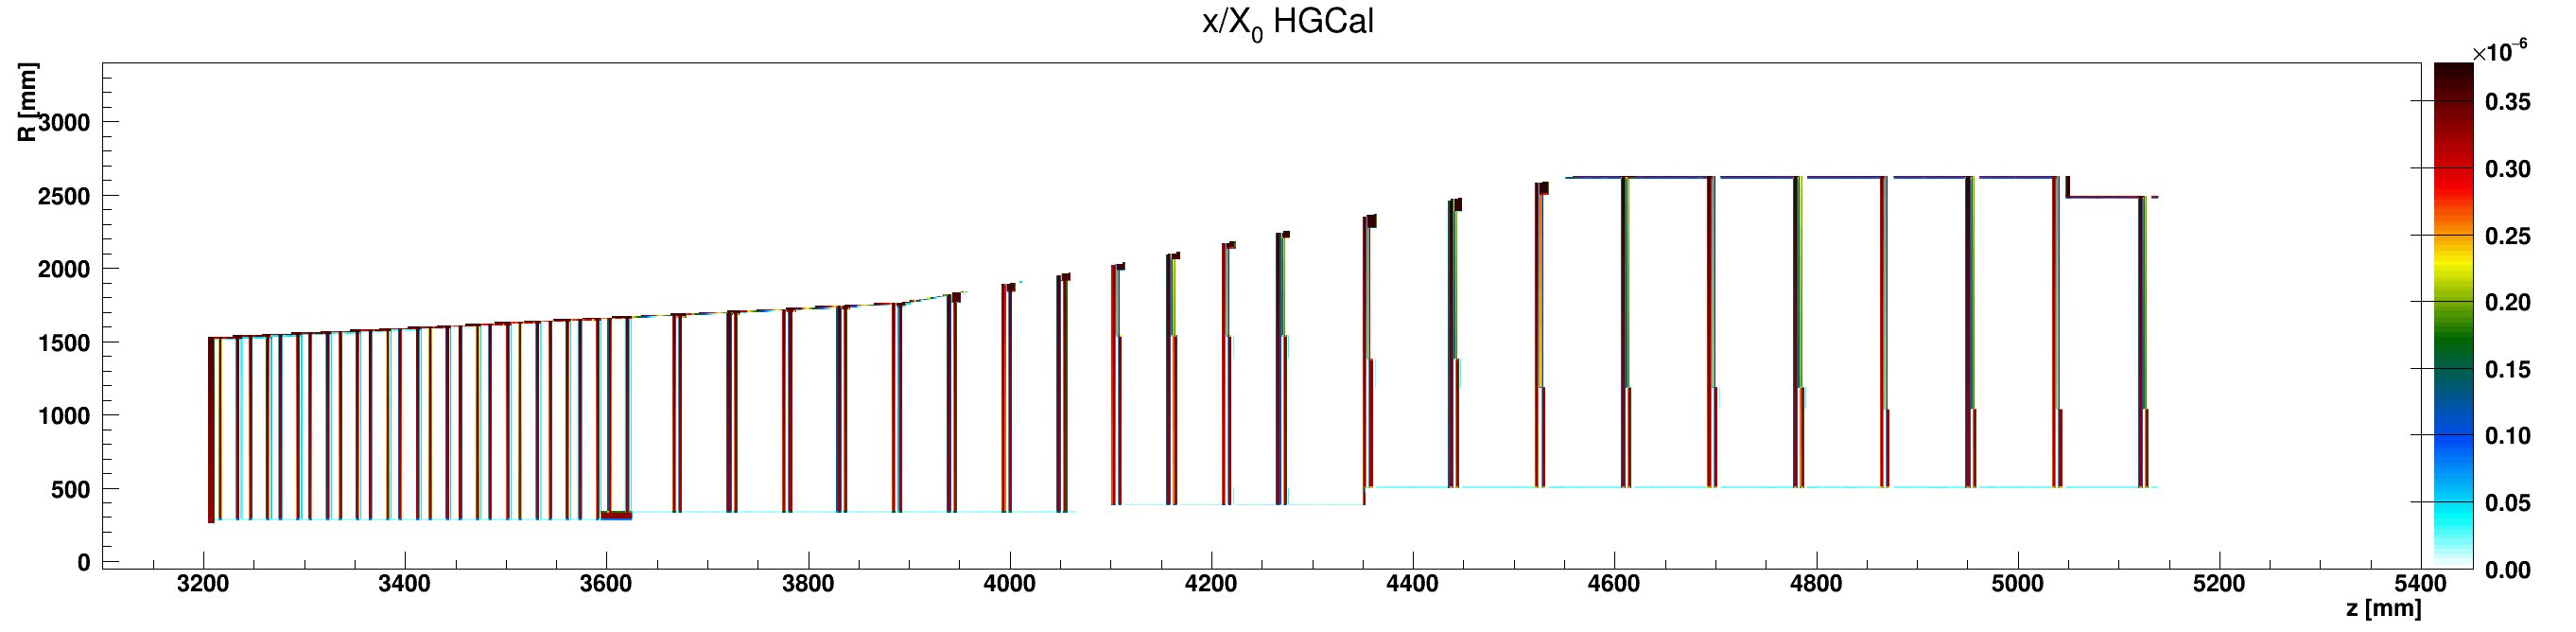 HGCal_x_vs_z_vs_RlocAir_ZplusZoom.png